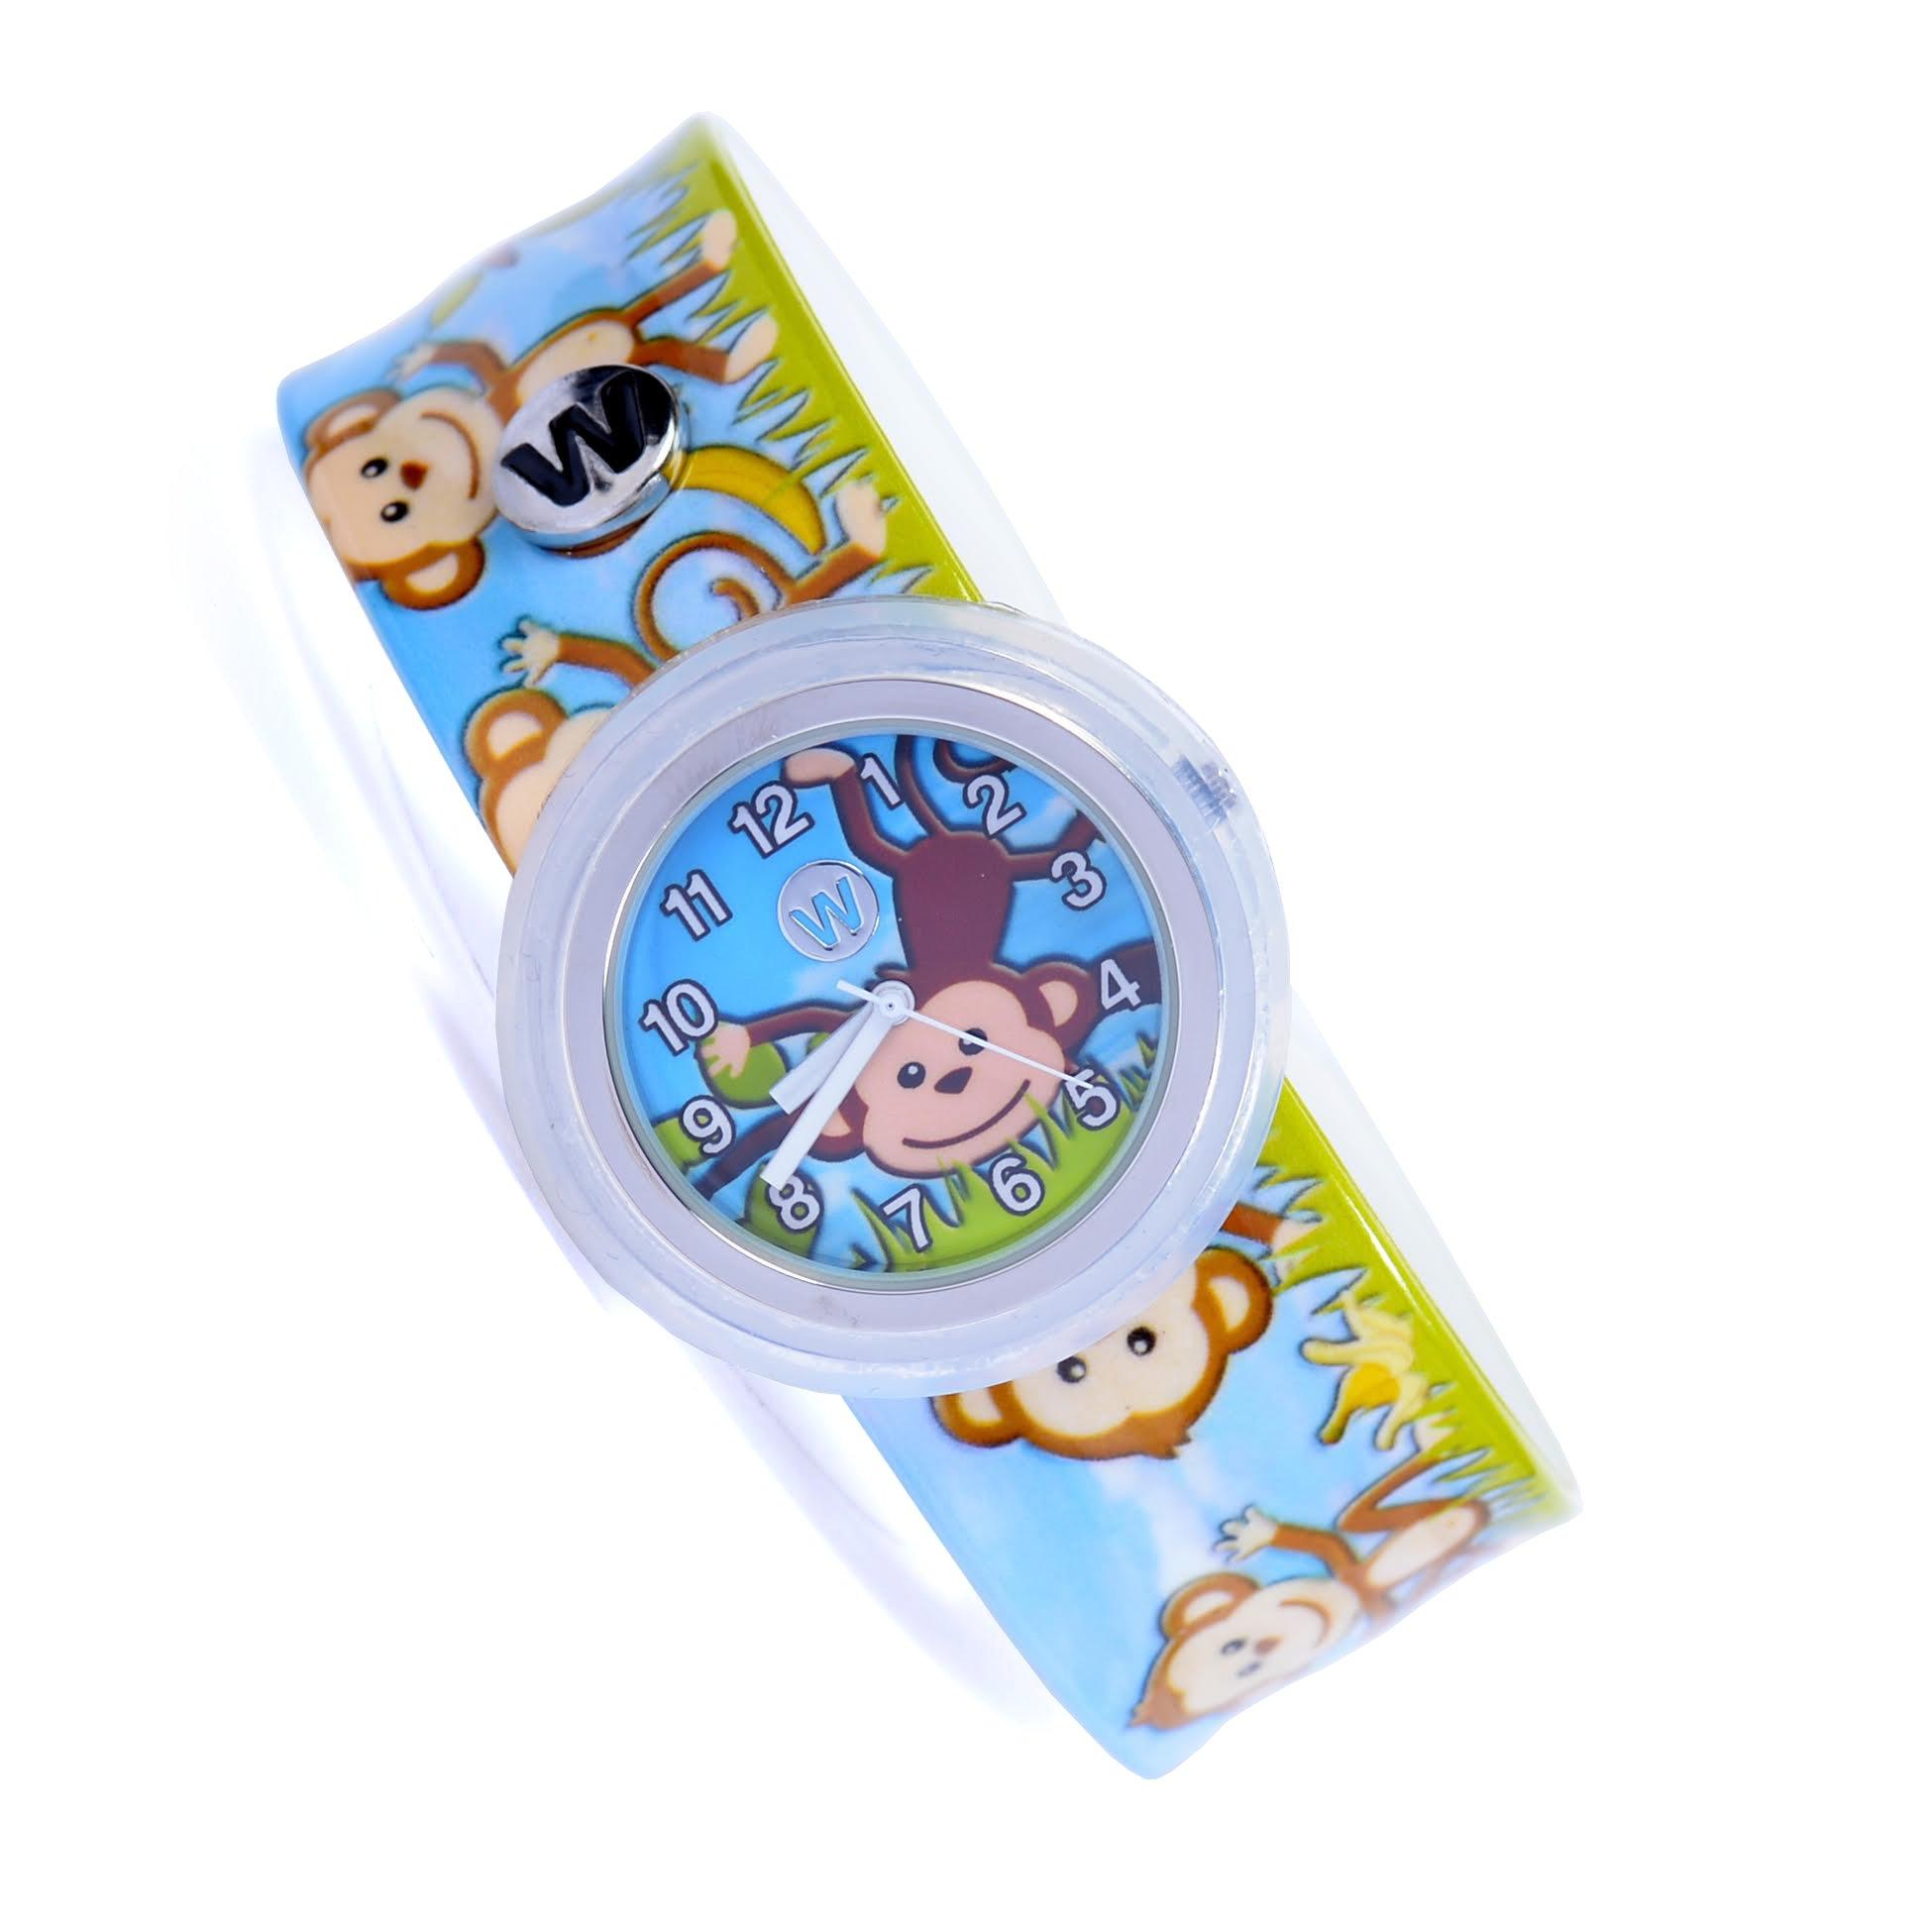 Watchitude Plunge Proof Slap Watch - Monkey Business - Kids Watch for Boys & Girls